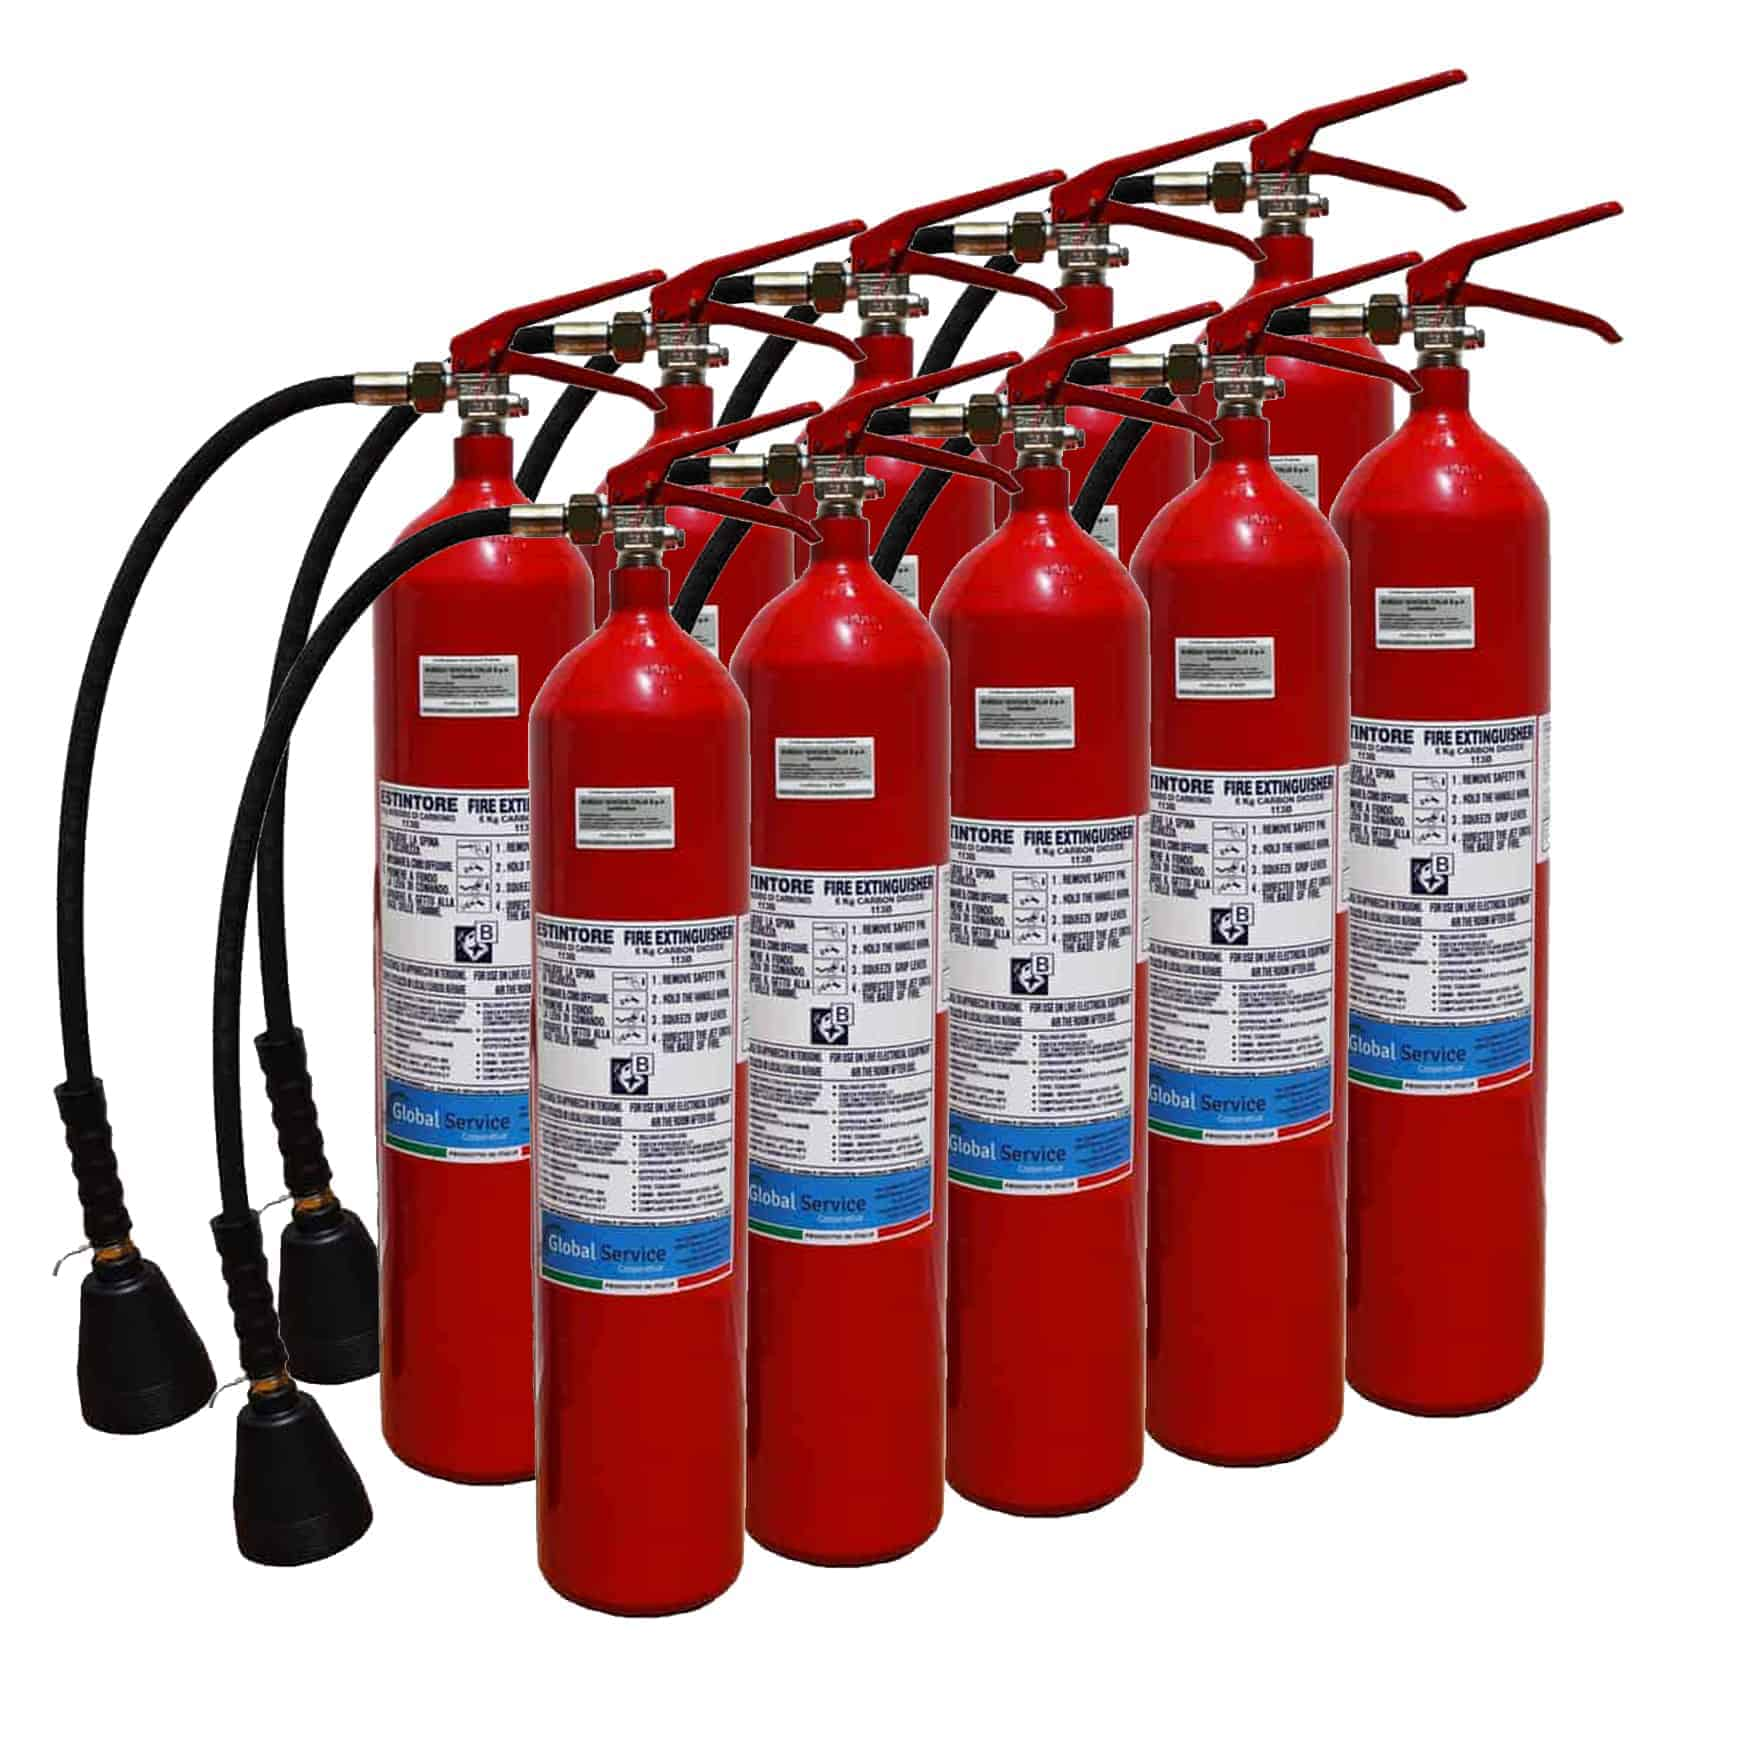 Estintore CO2 5 Kg x 10 - Antincendio - Cooperativa Global Service